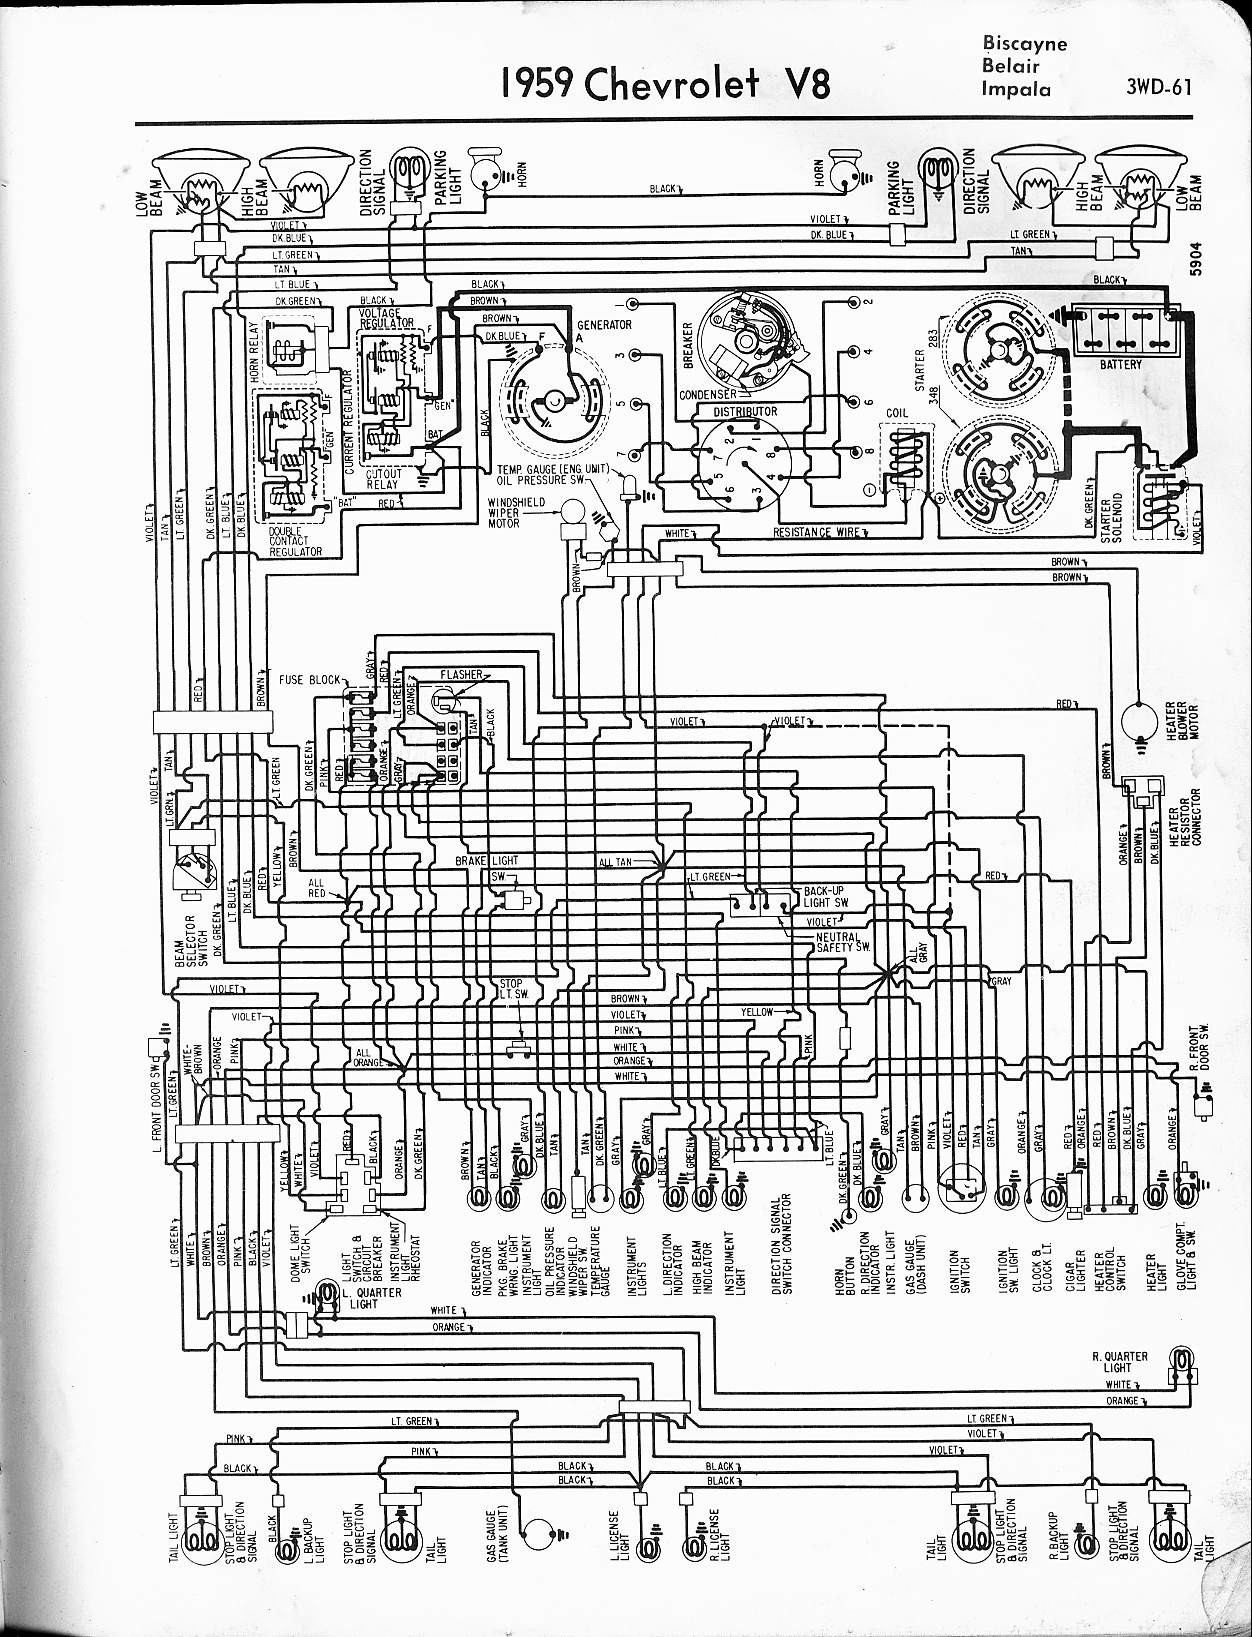 2000 Chevy Impala 3 4 Engine Diagram | Diagram